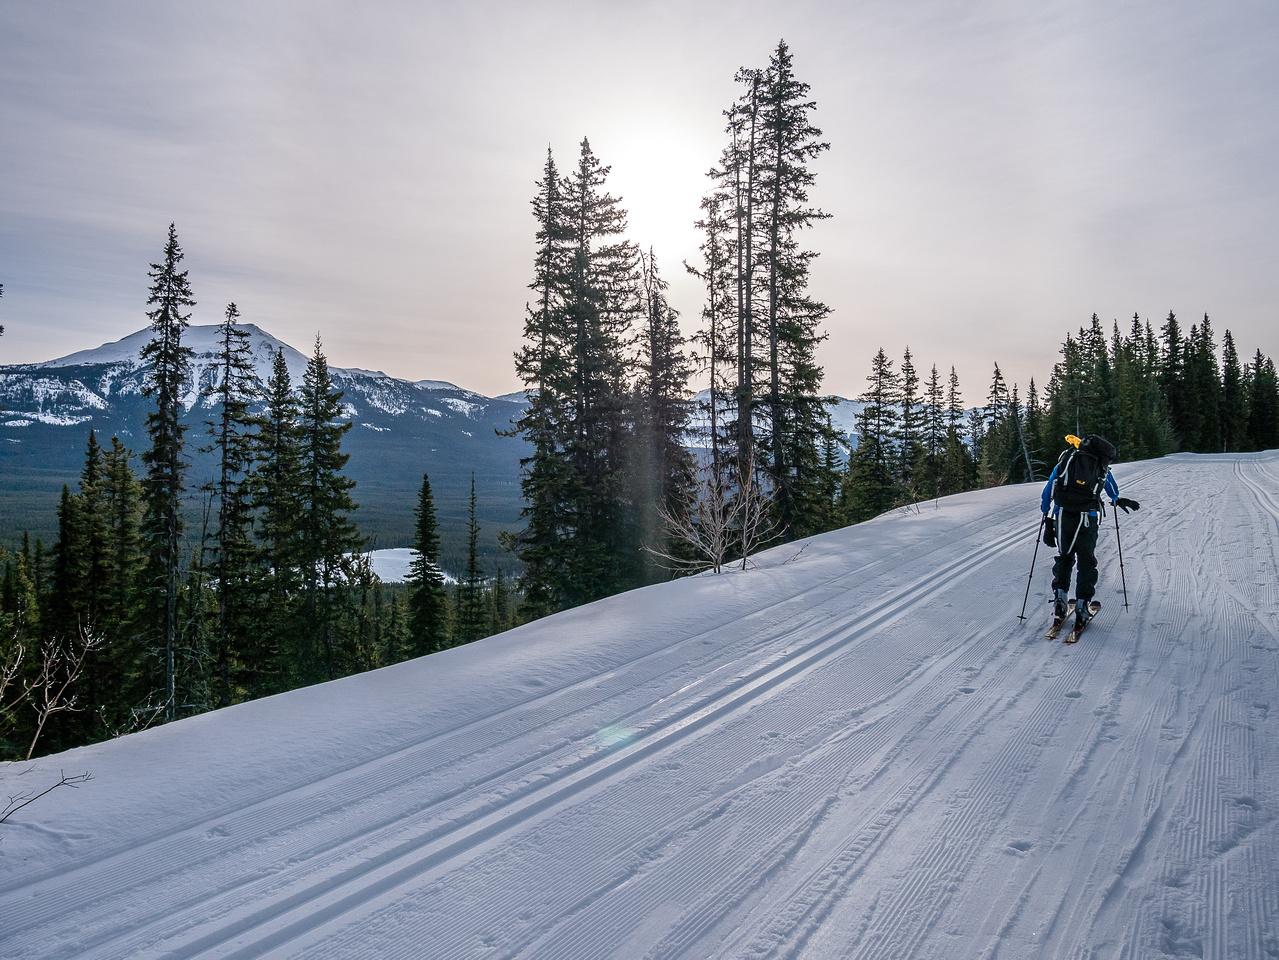 Steven skis up the Moraine Lake road.